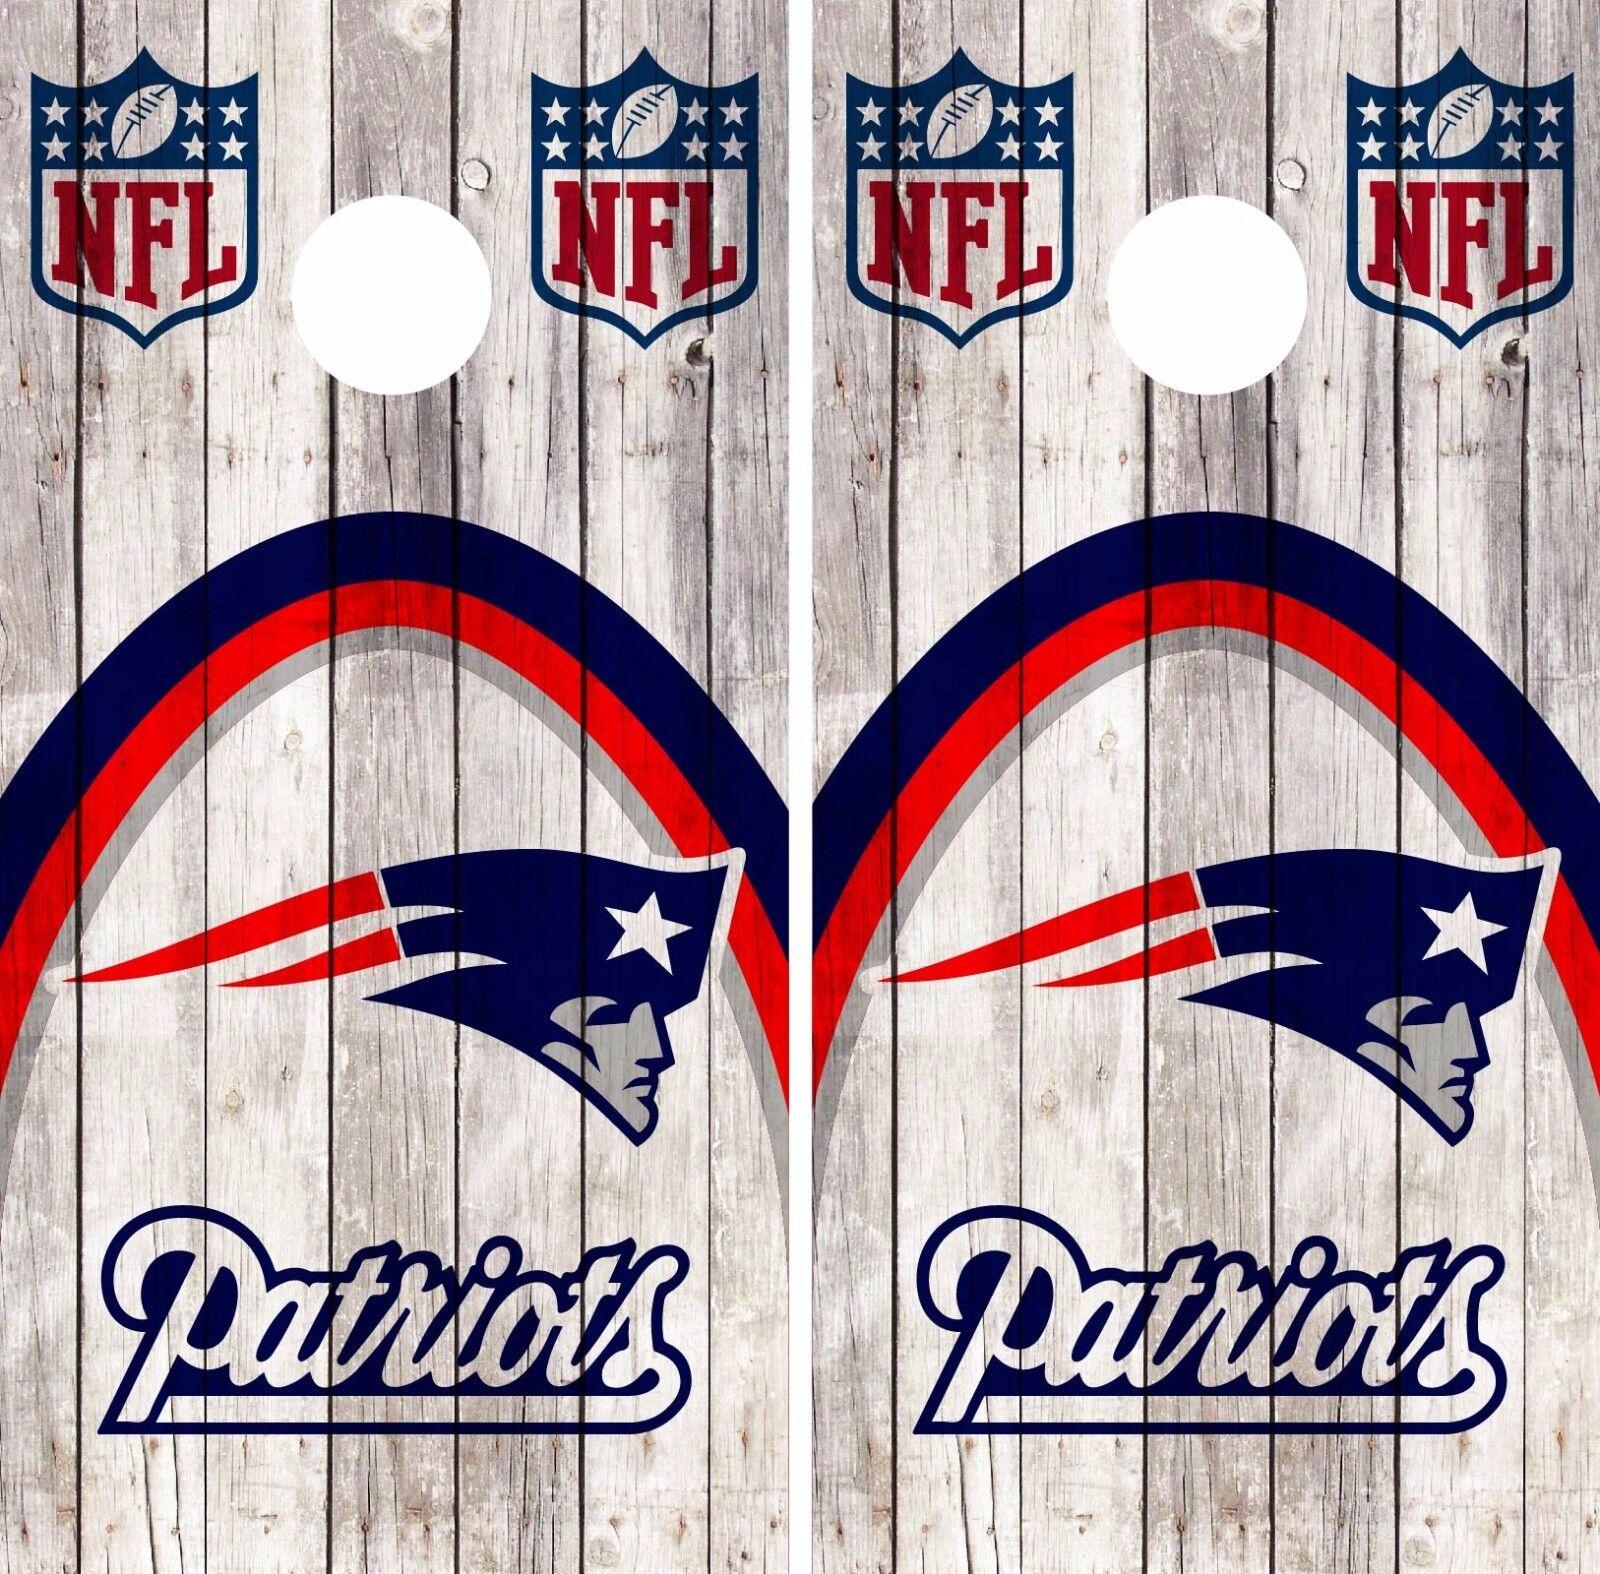 New England Patriots Cornhole Skin Wrap NFL Football Vintage Vinyl  Decal DR56  100% fit guarantee